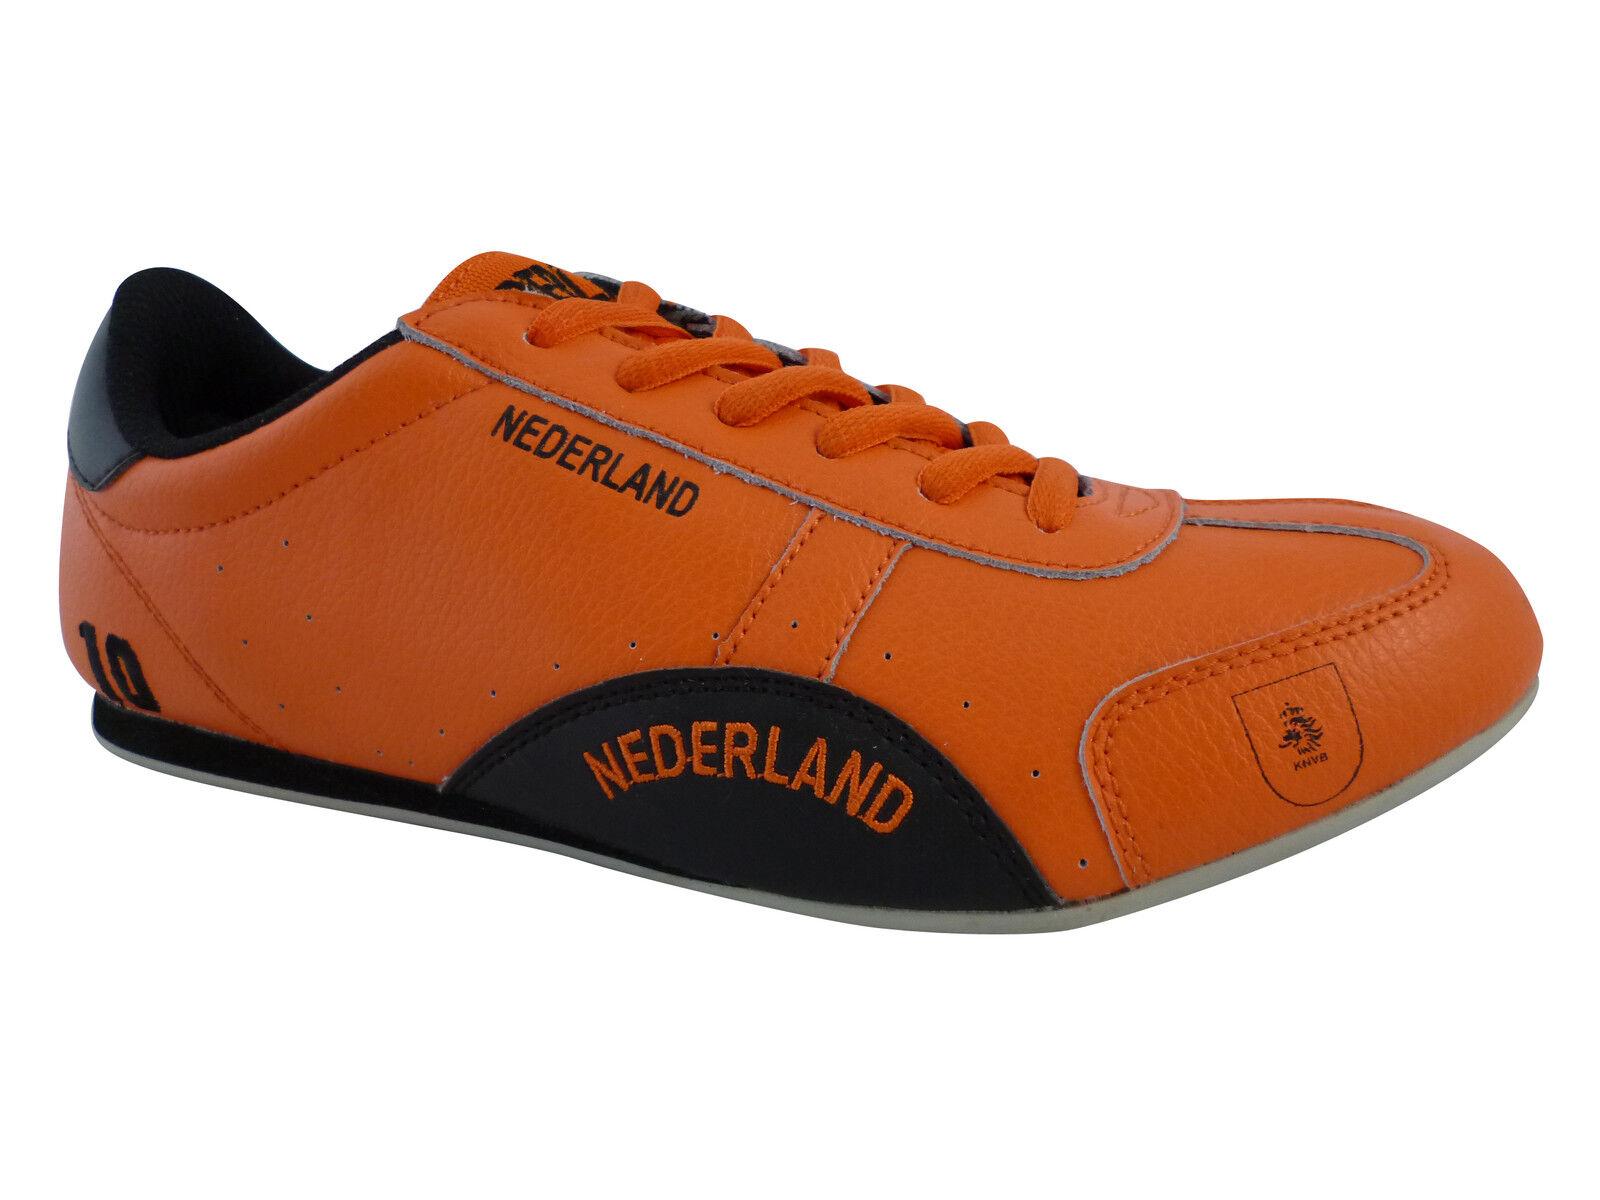 SPOOKS   NIEDERLANDE  Orange   WM  SCHUHE  LEDER  NEU  Fan Artikel  Grösse   38